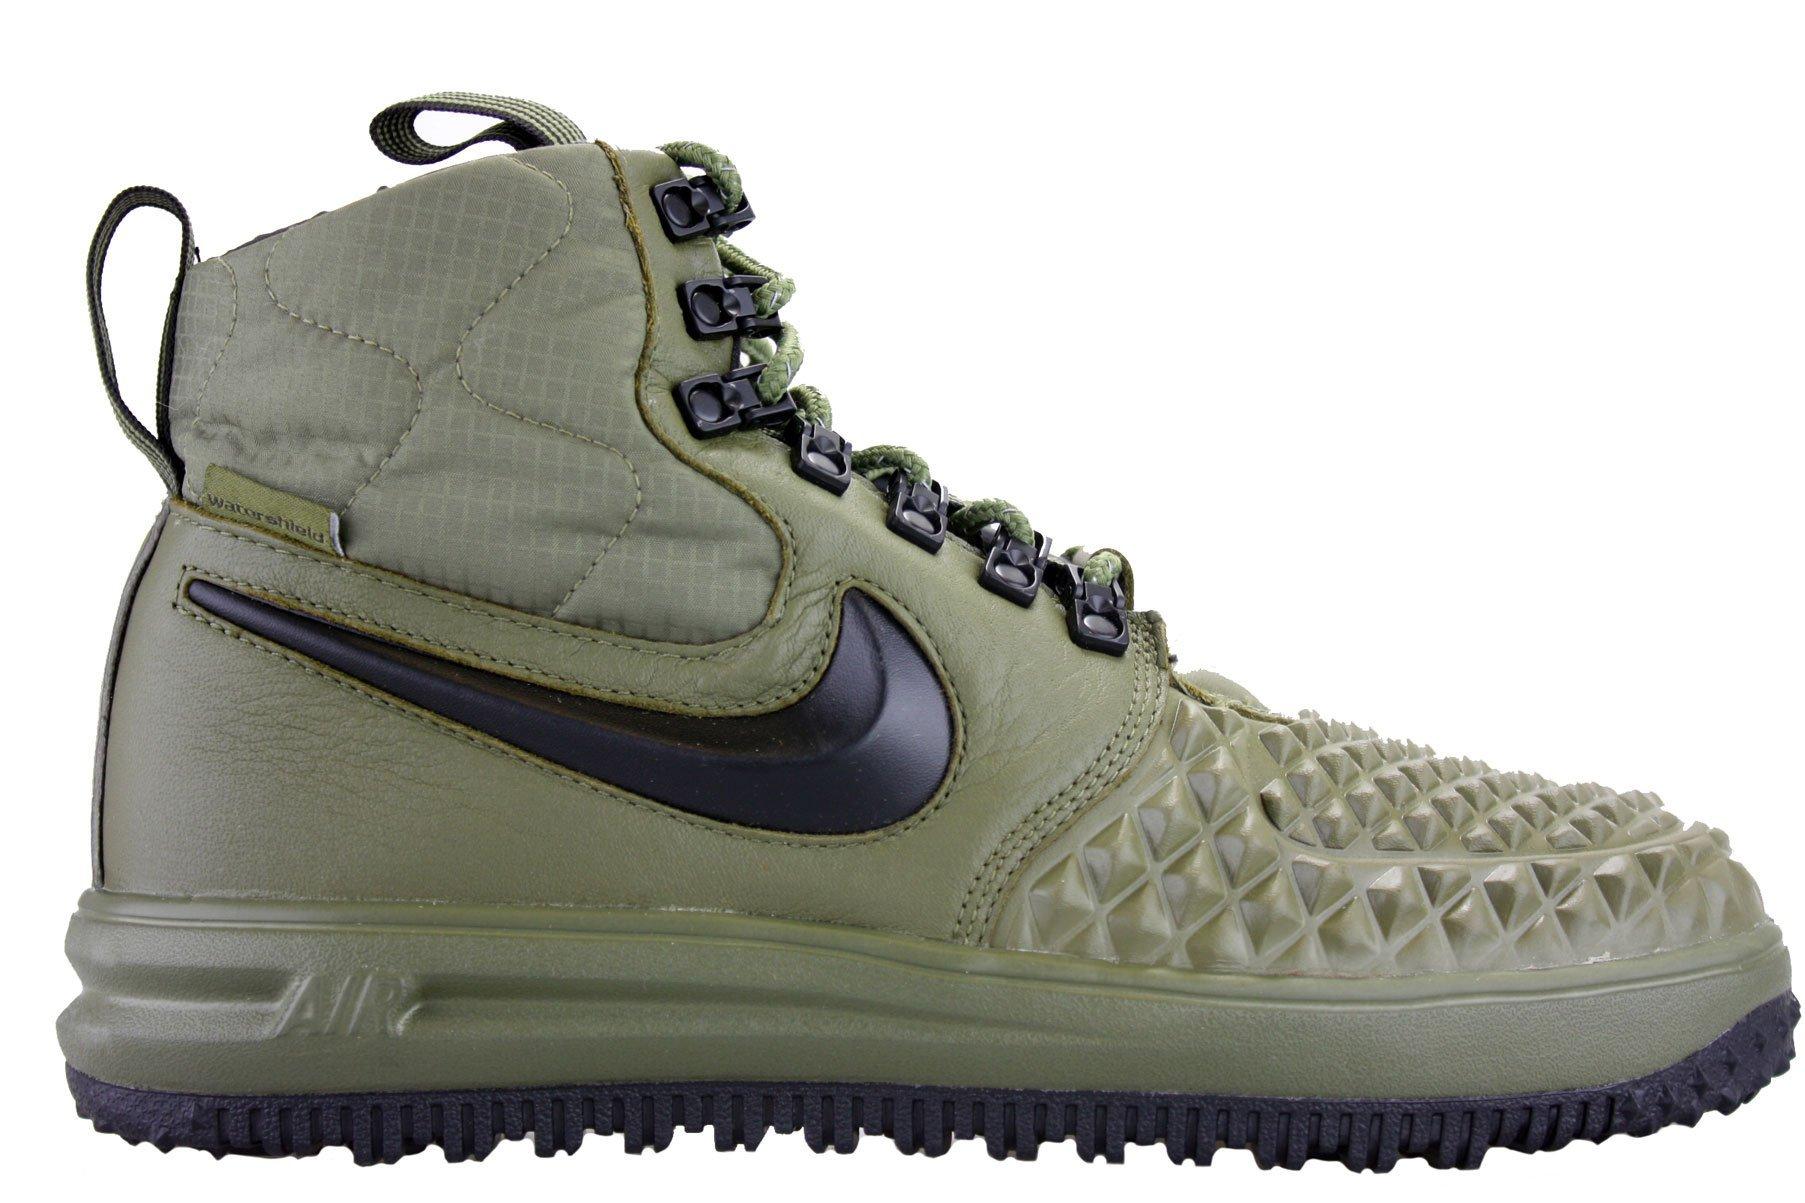 separation shoes d96cf a0d67 Galleon - Nike Mens Lunar Force 1 Duckboot  17 Medium Olive Black-Wolf Grey  916682-202 Size 9.5